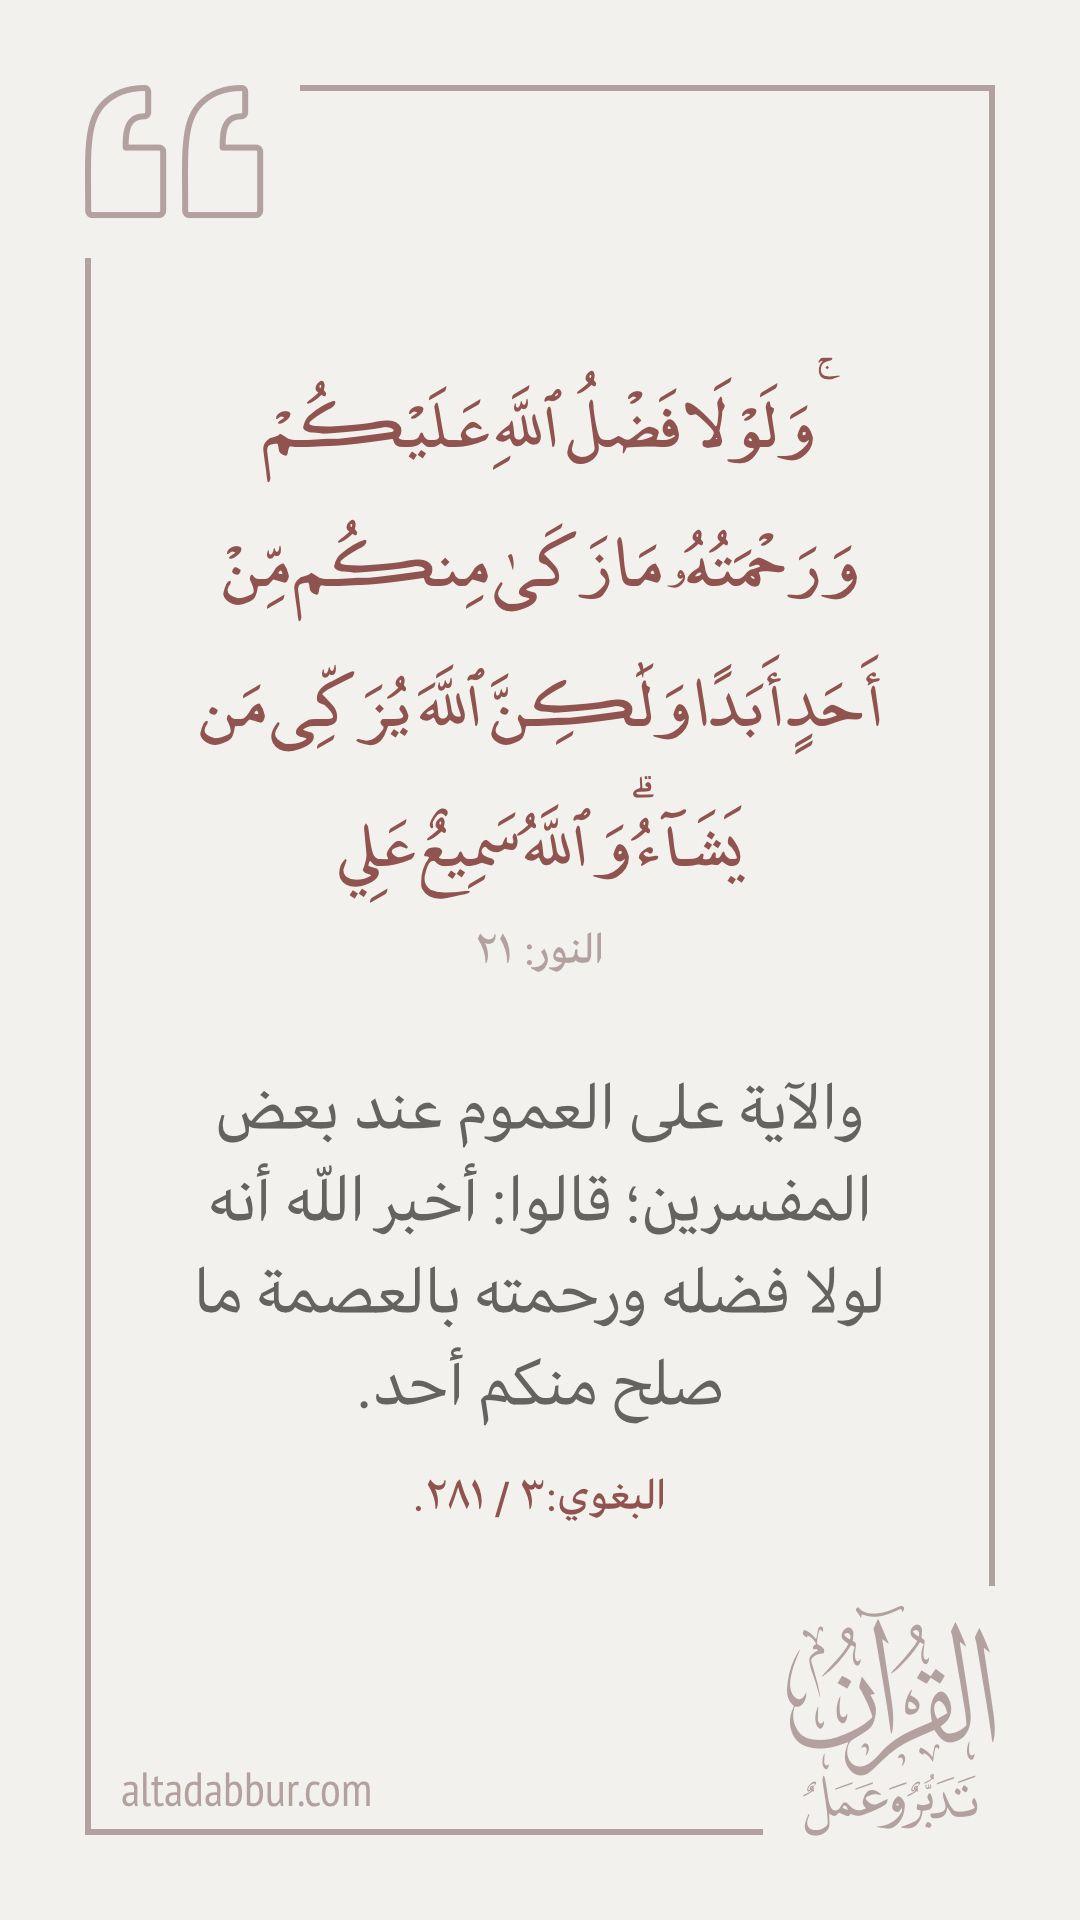 Pin By Maroma Ahmed On قرآن تفسير وتدب ر In 2020 Quran Quotes Quran Tafseer Holy Quran